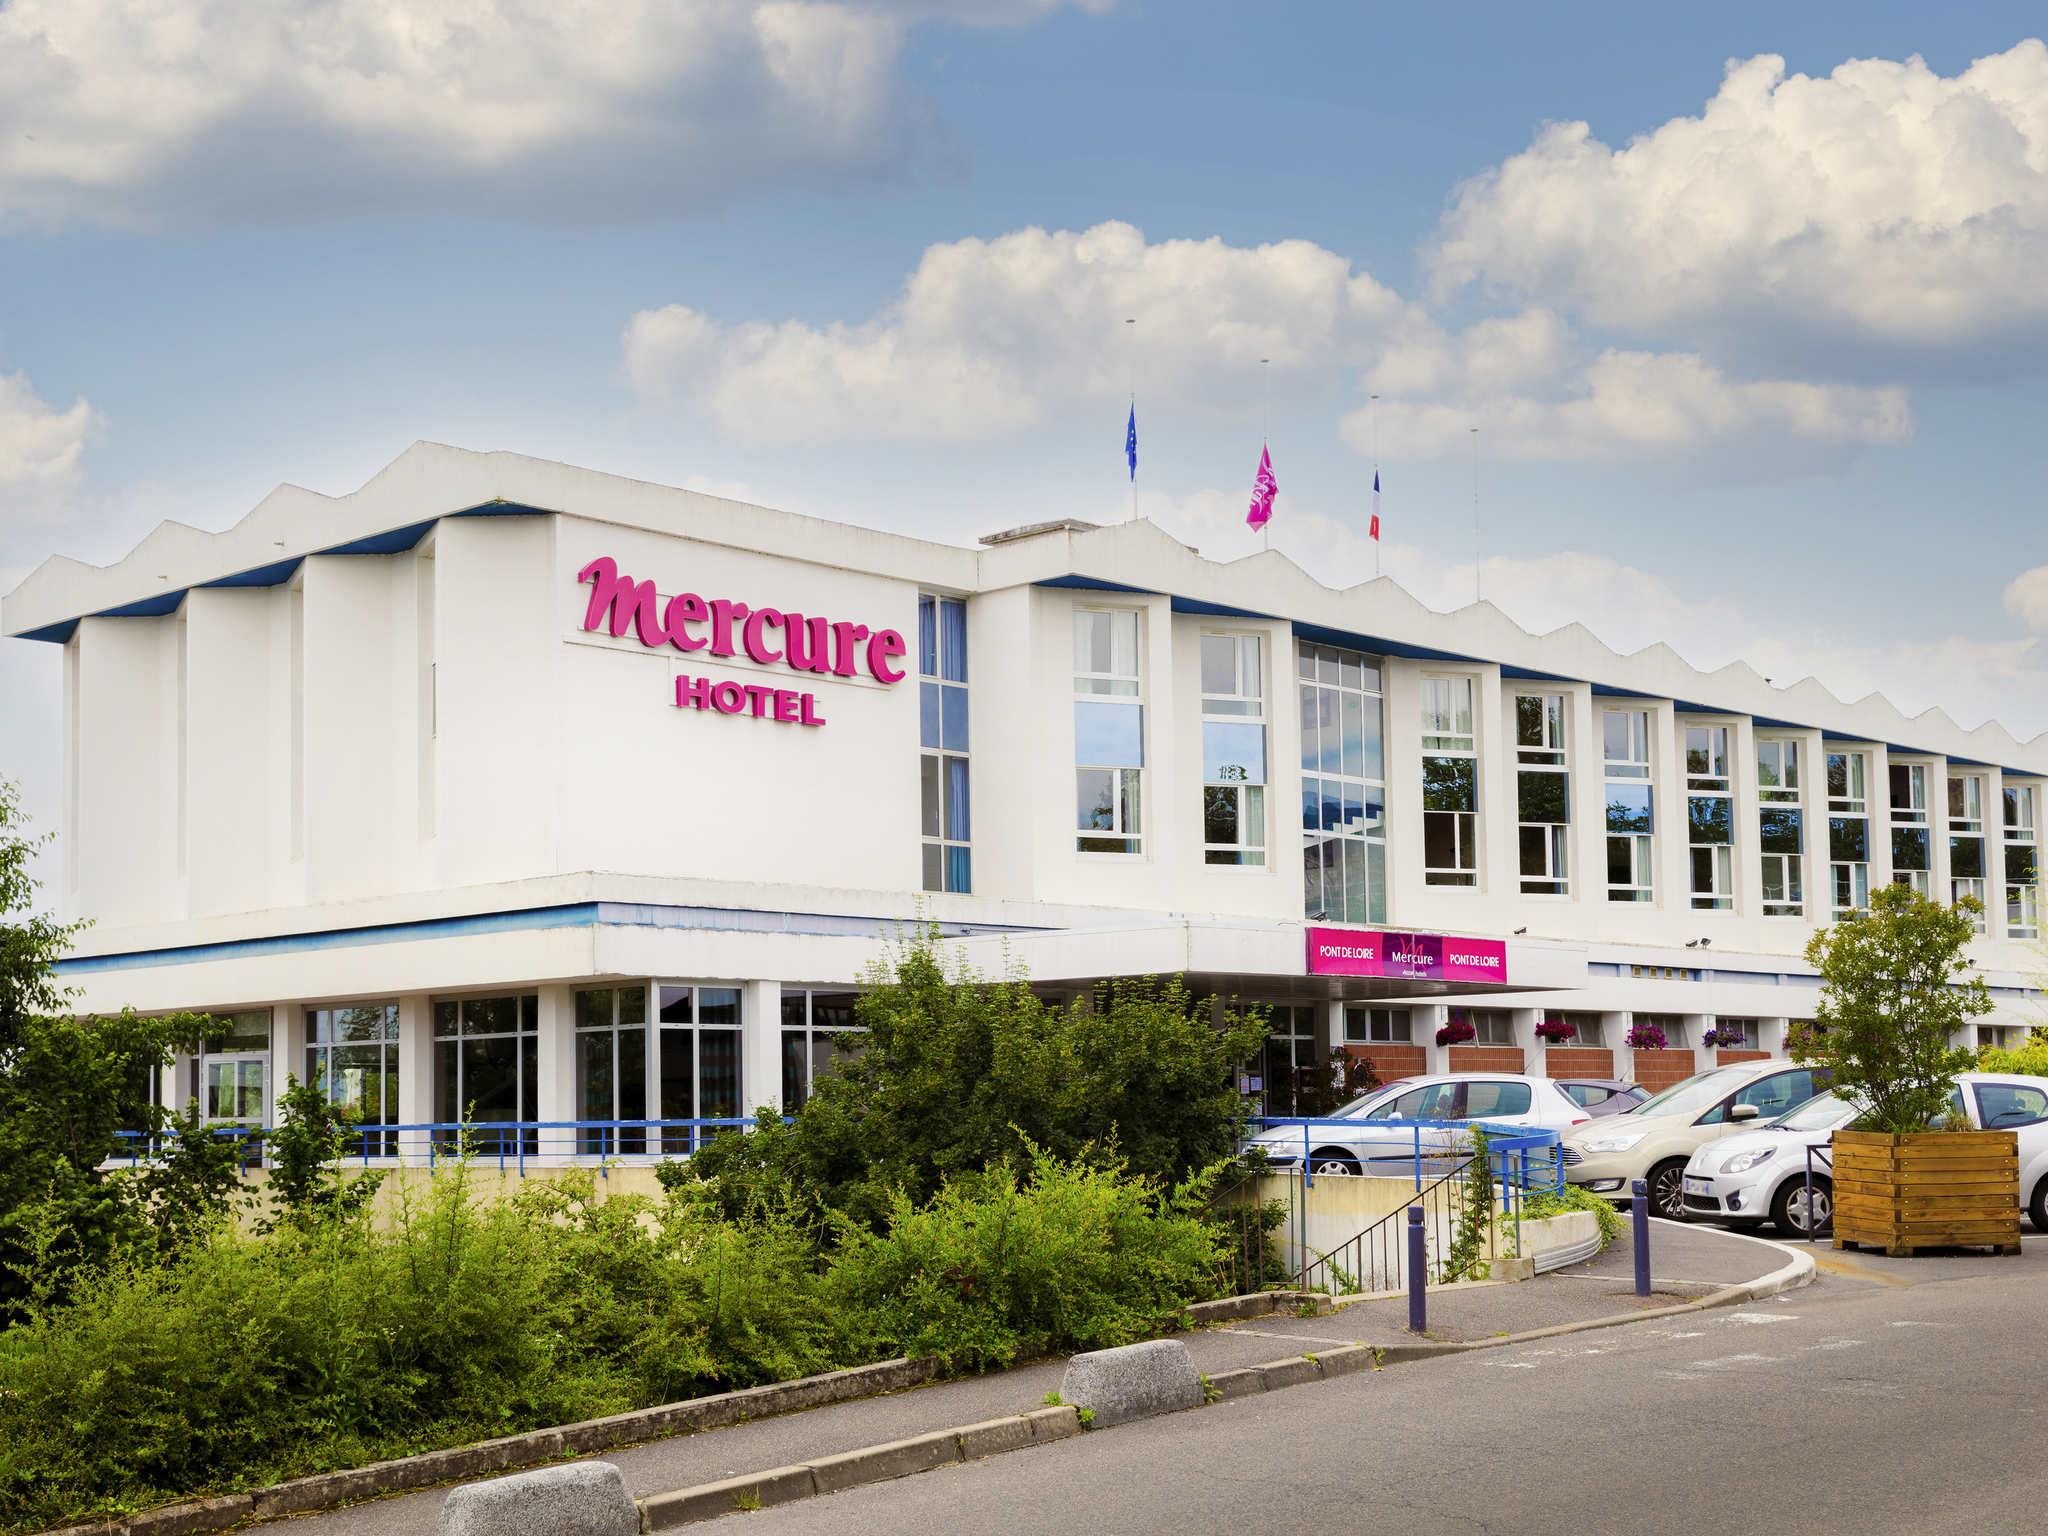 Hotel - Mercure Nevers Pont de Loire Hotel